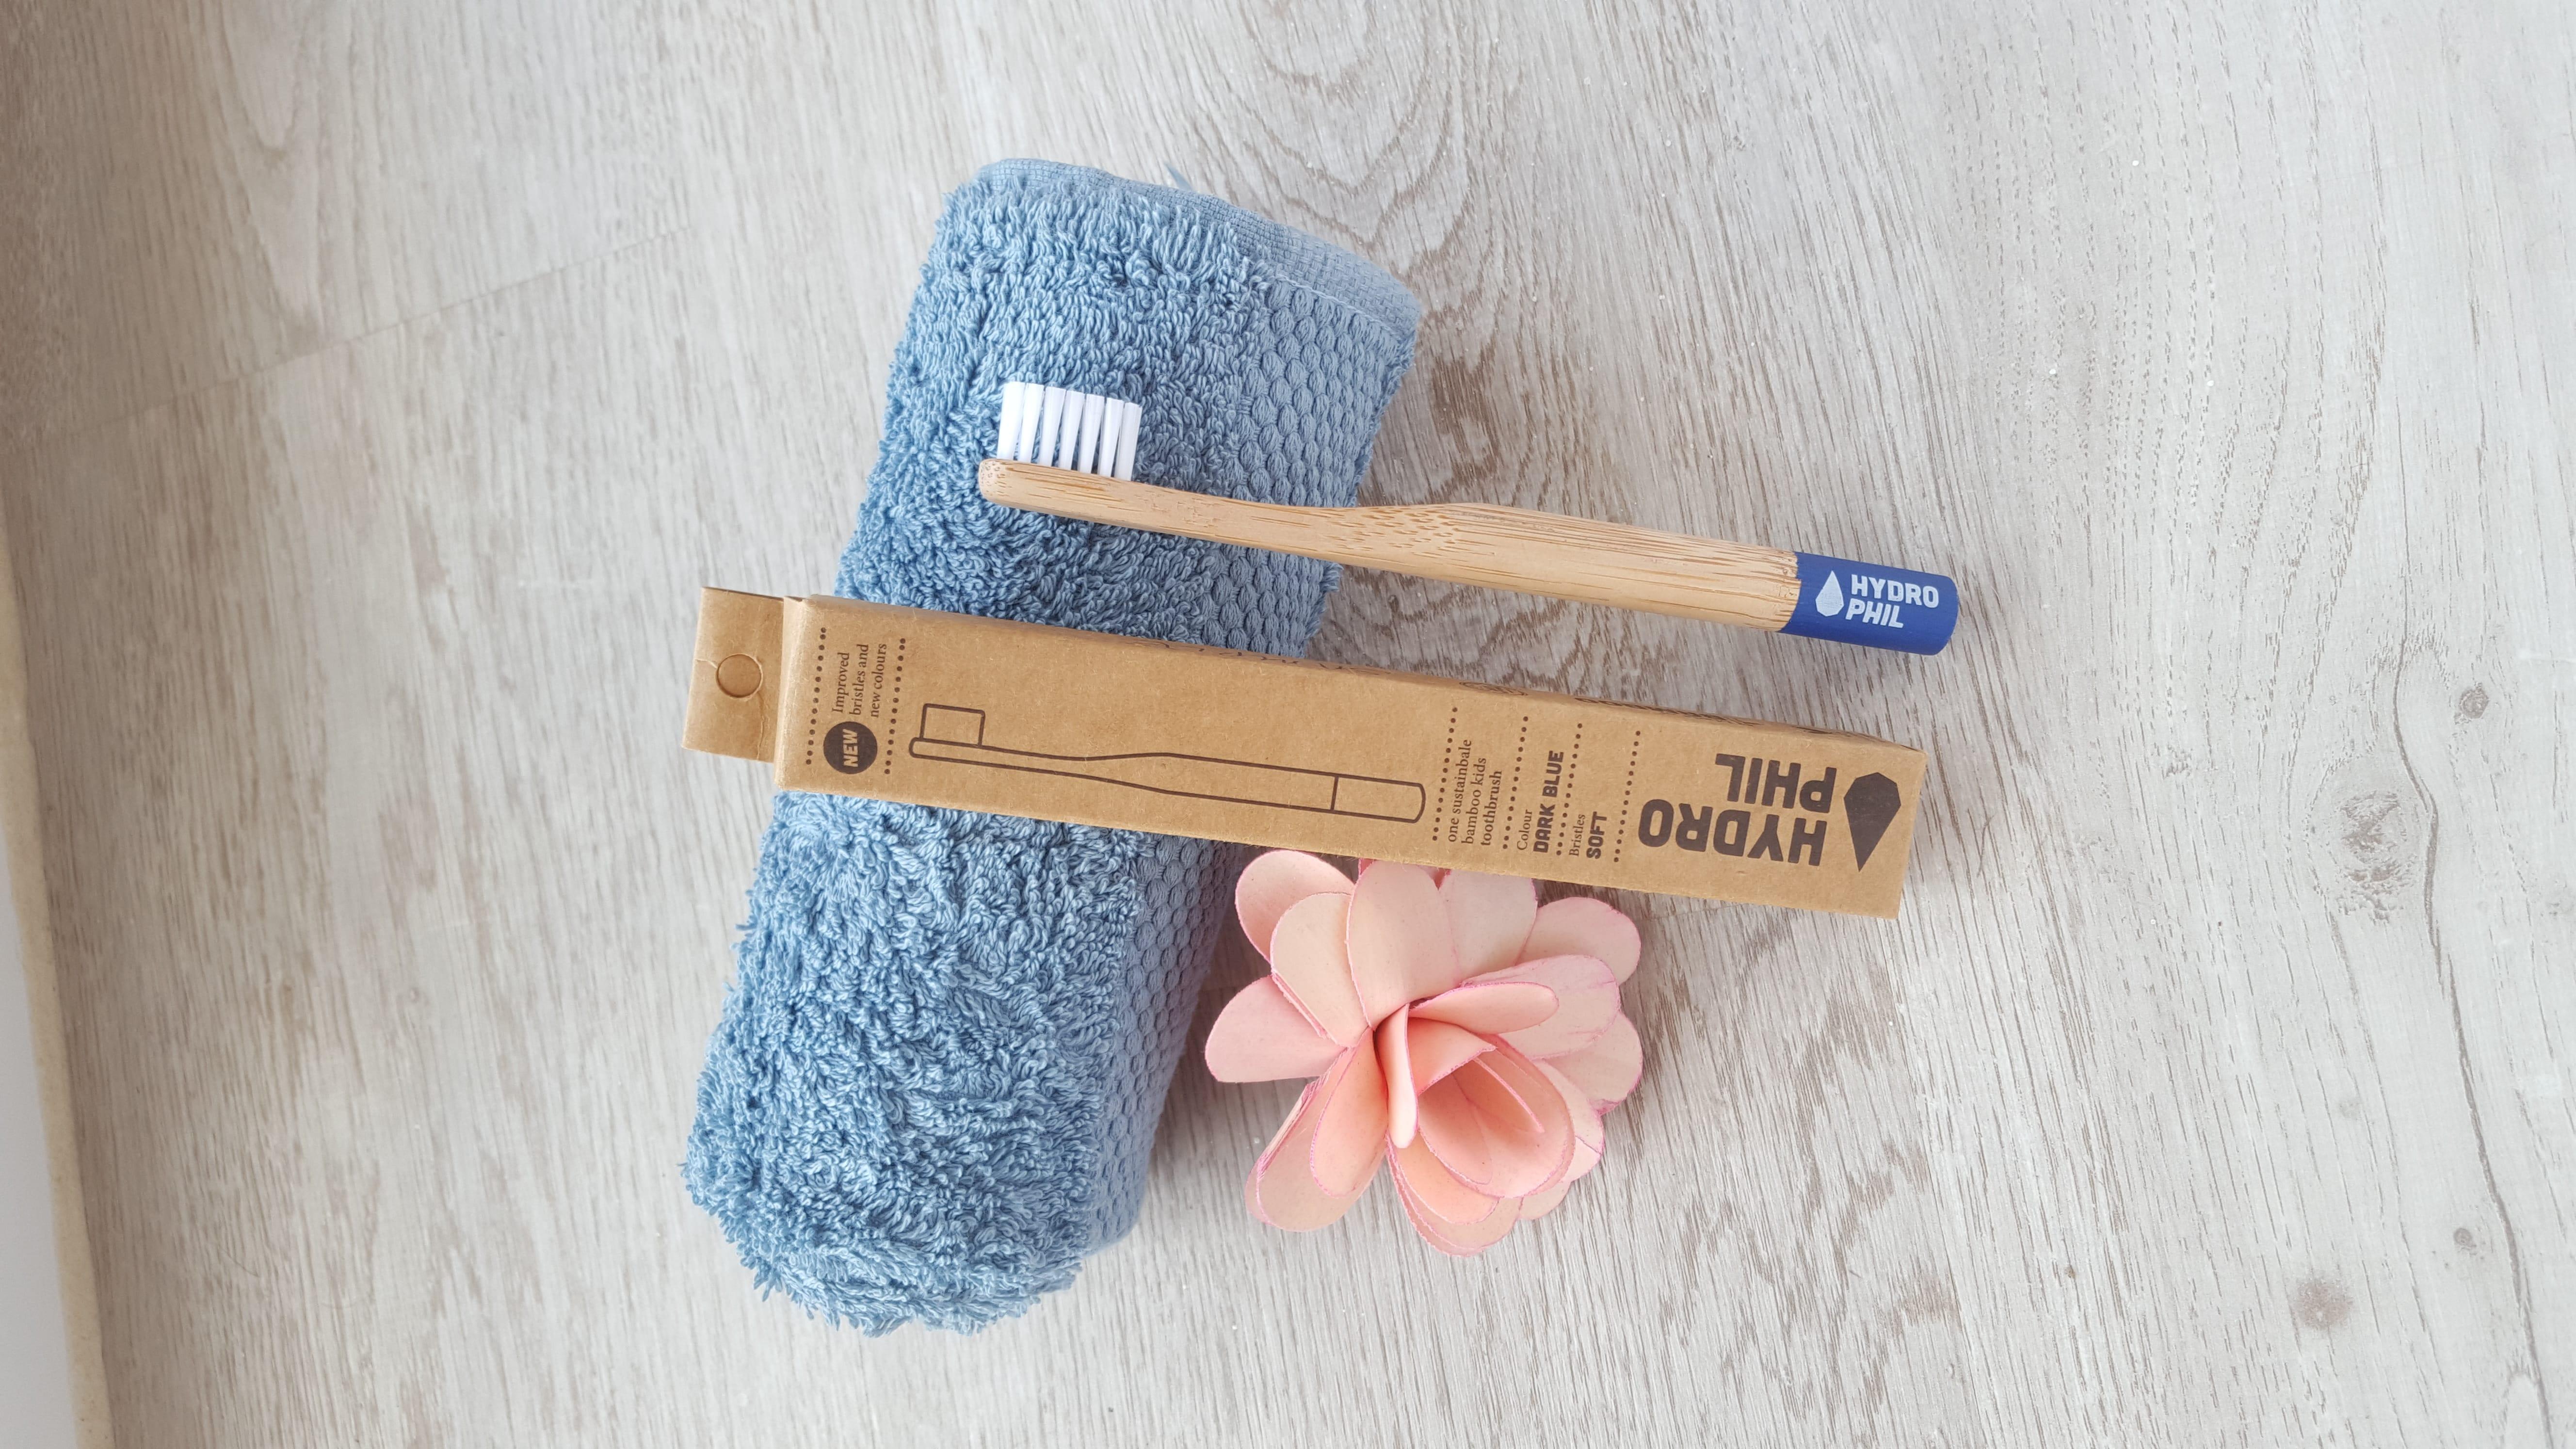 Cepillo de dientes de bambú para niños